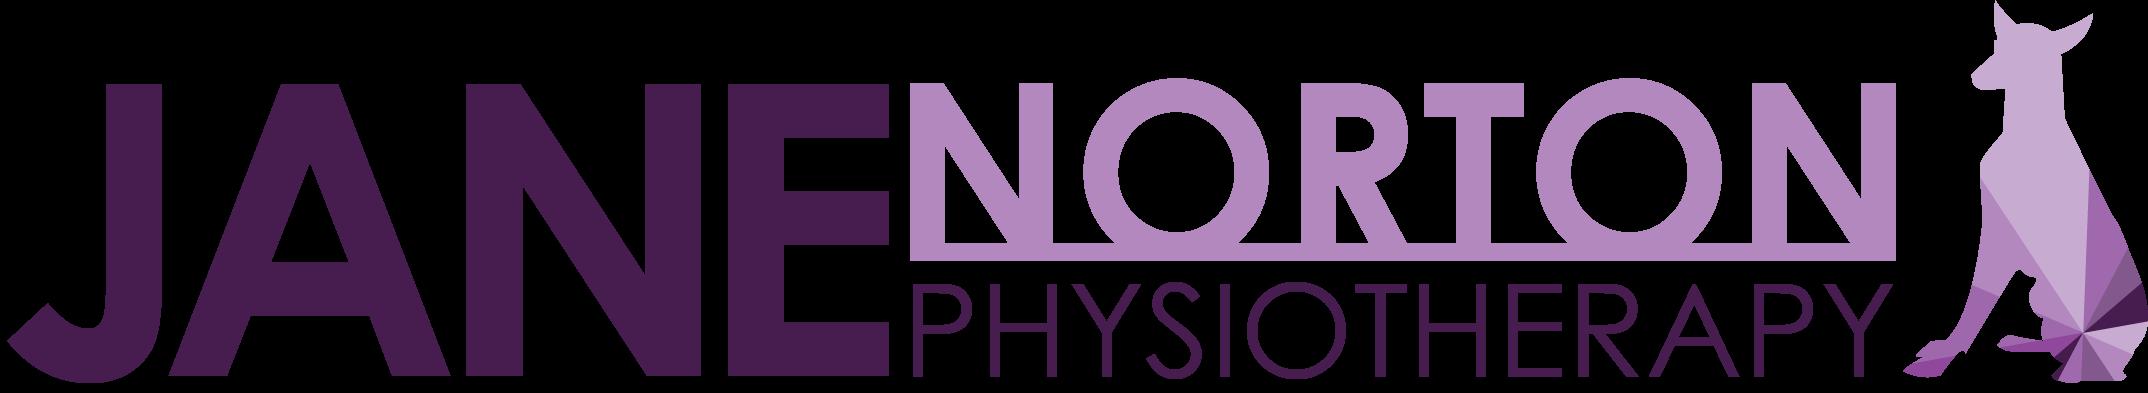 Jane Norton Physio